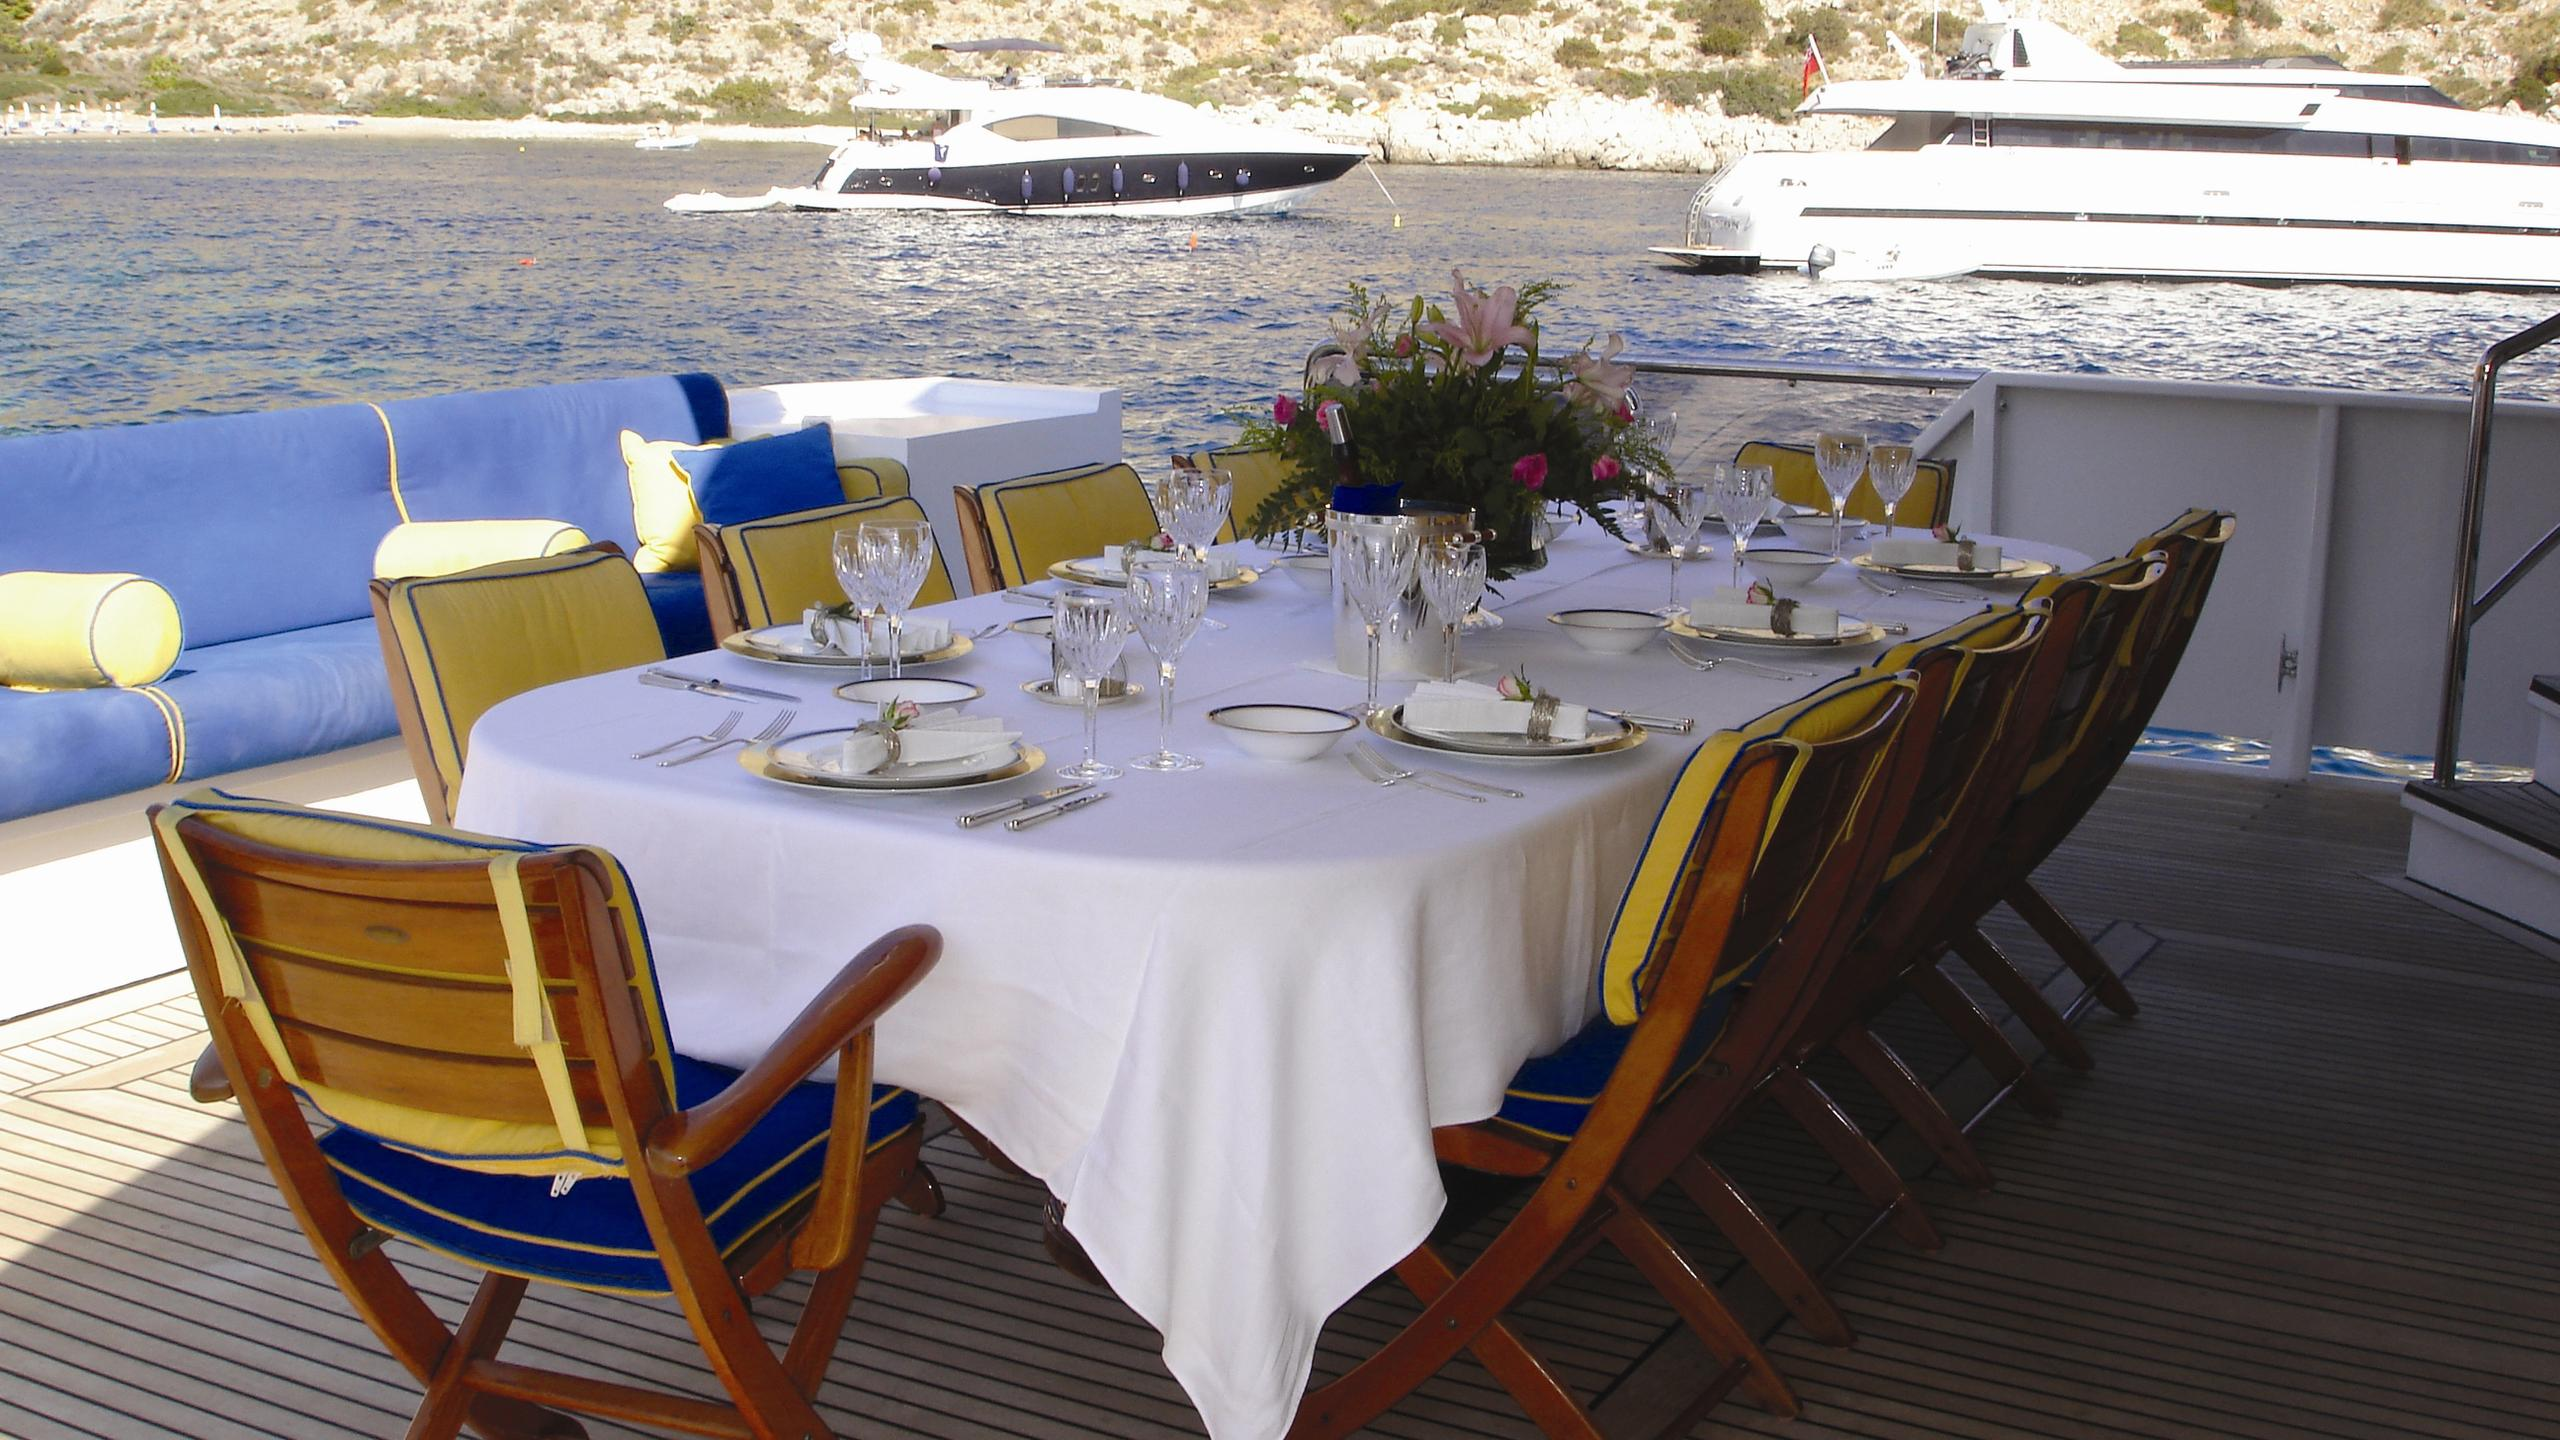 amz-yacht-aft-dining